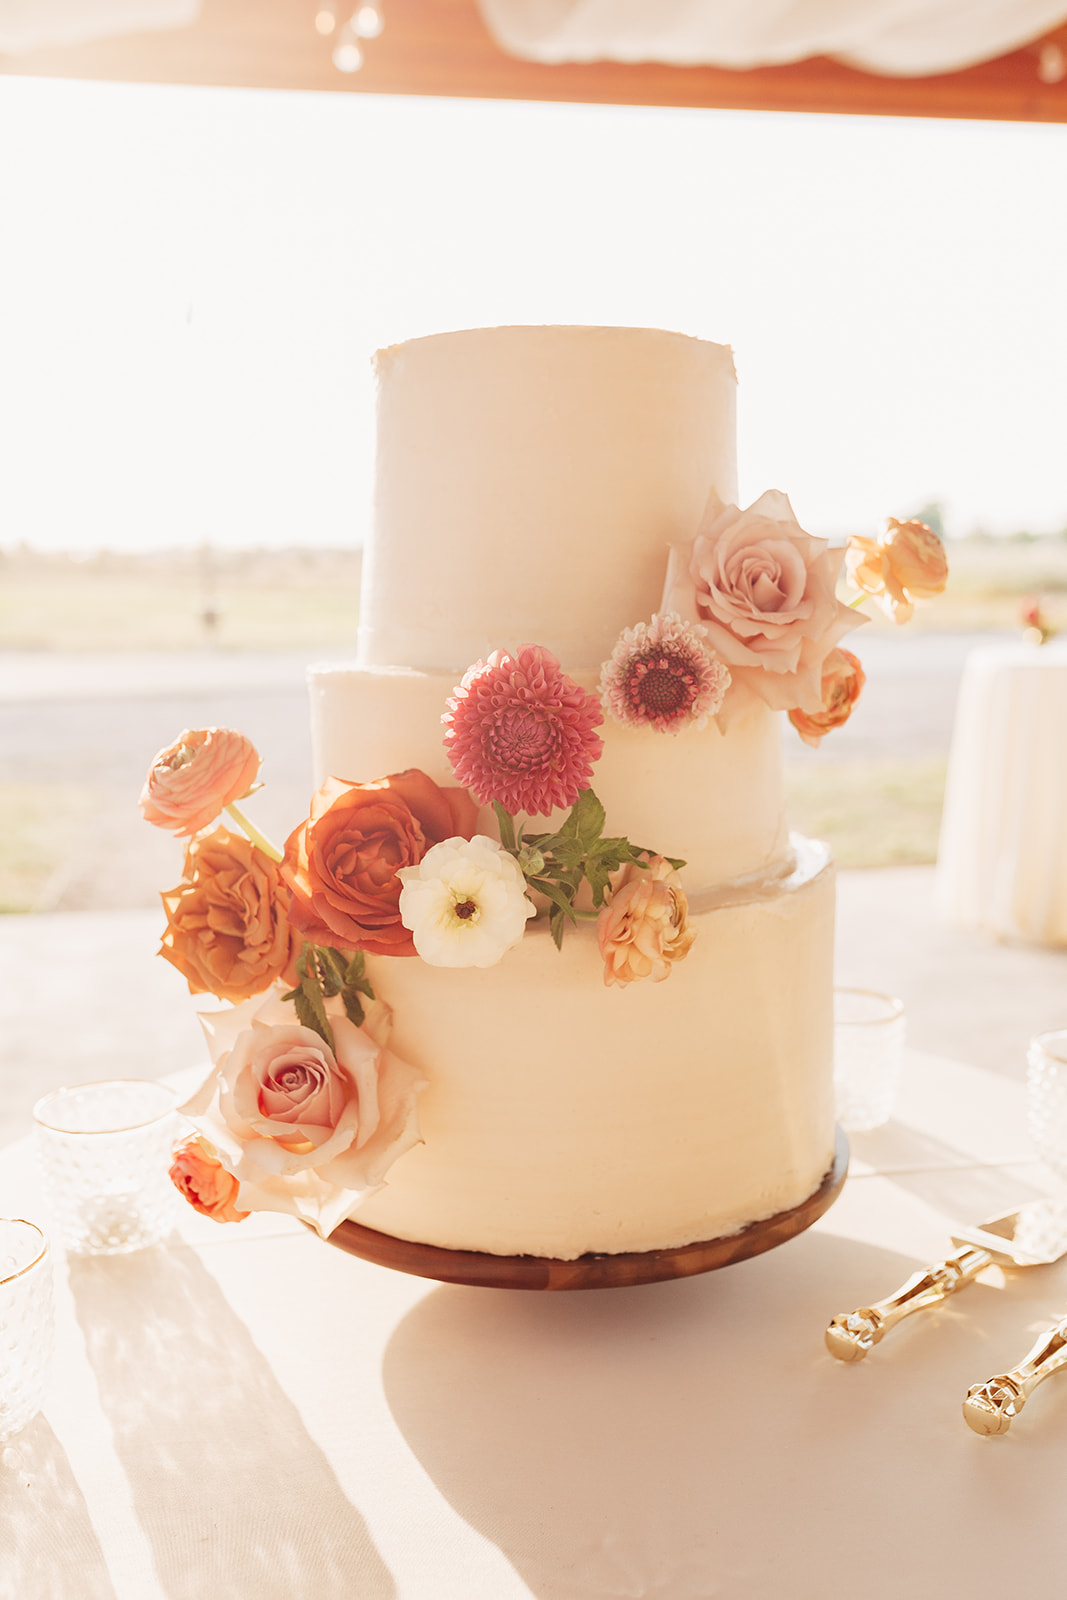 Our wedding cake was so delicious! www.twistmepretty.com